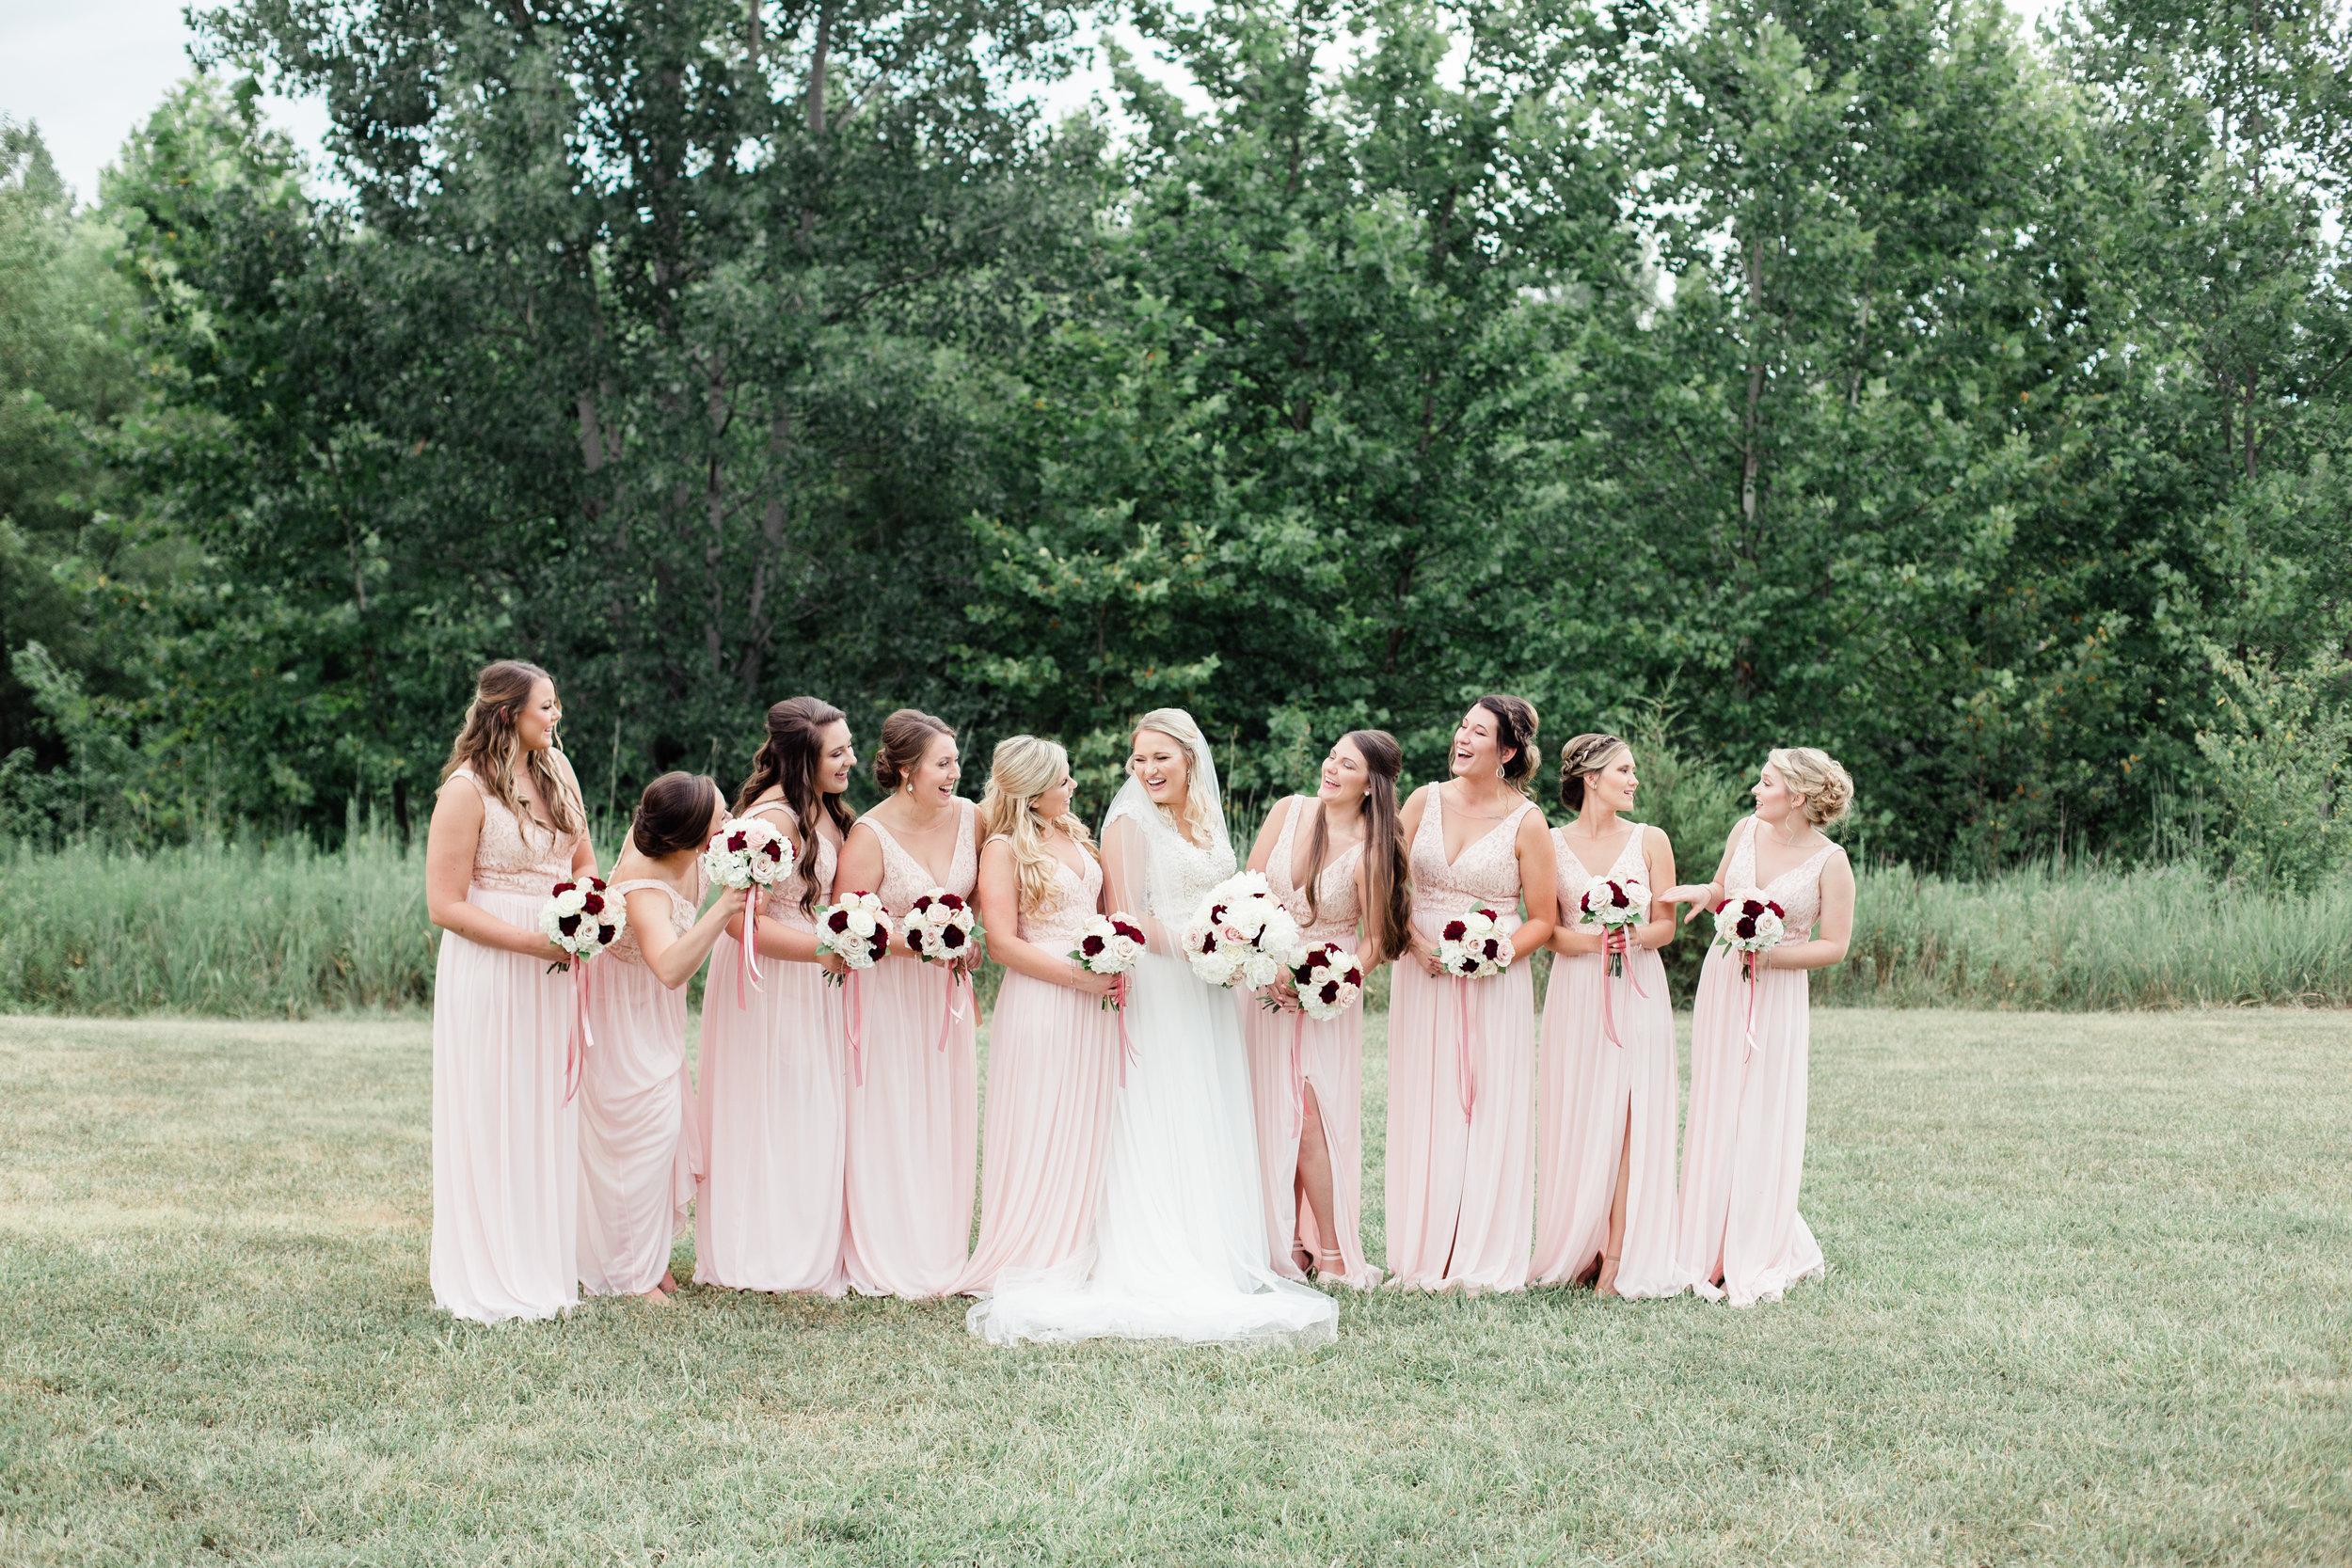 Dorothy_Louise_Photography_Marissa_Jake_Wentzville_MO_Wedding-62.jpg